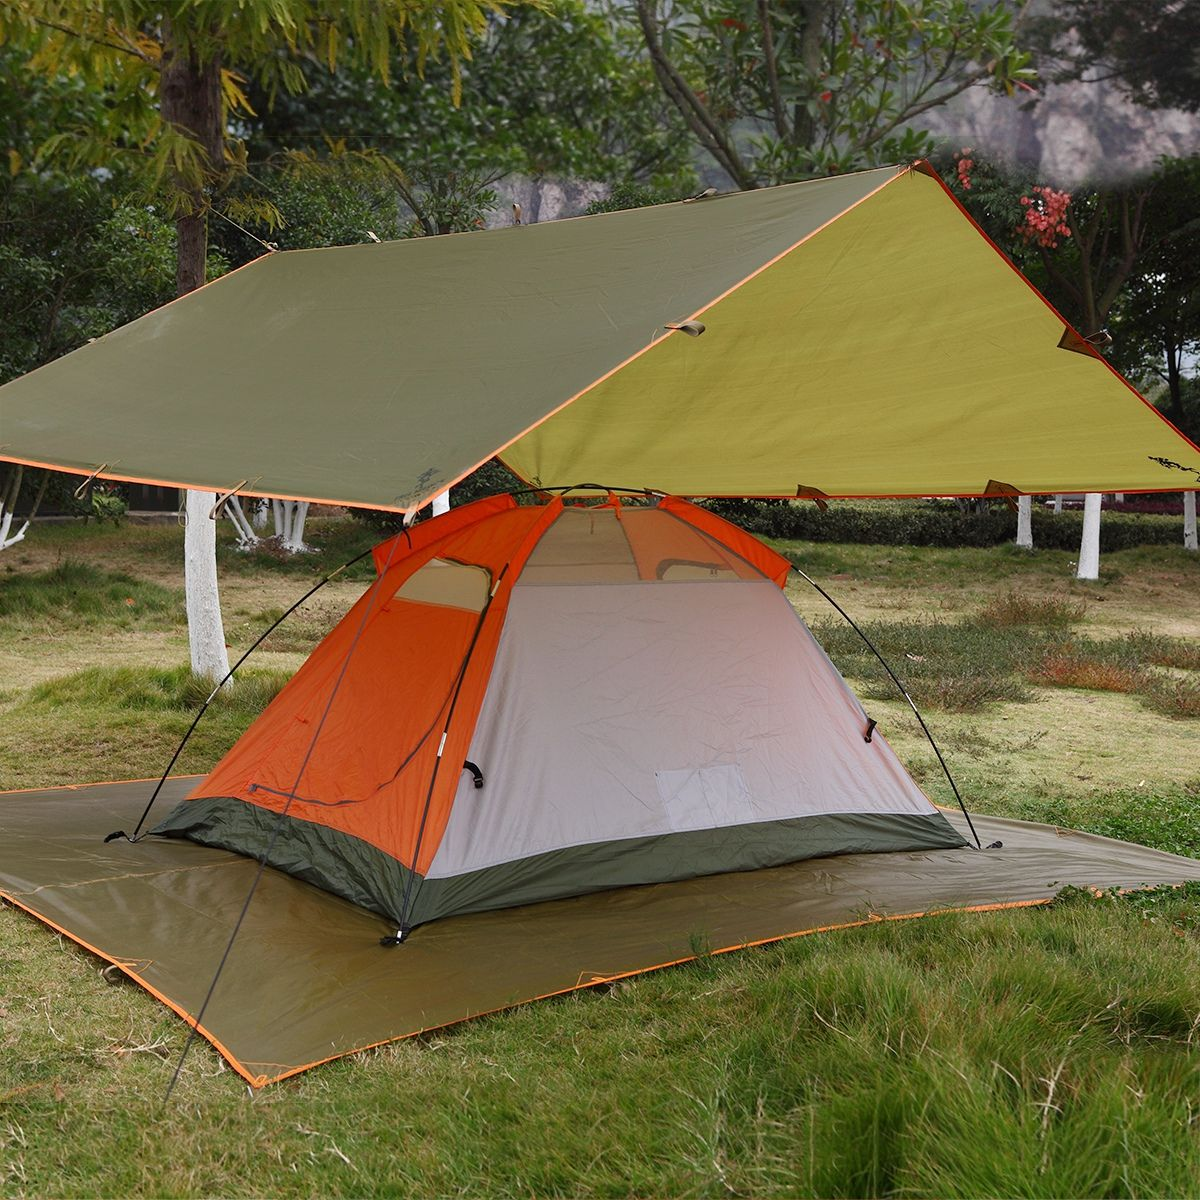 Free Soldier Waterproof Portable Tarp Multifunctional Outdoor Camping Awning Backpacking Rain Tarp Camping Tarp Tent Tent Camping